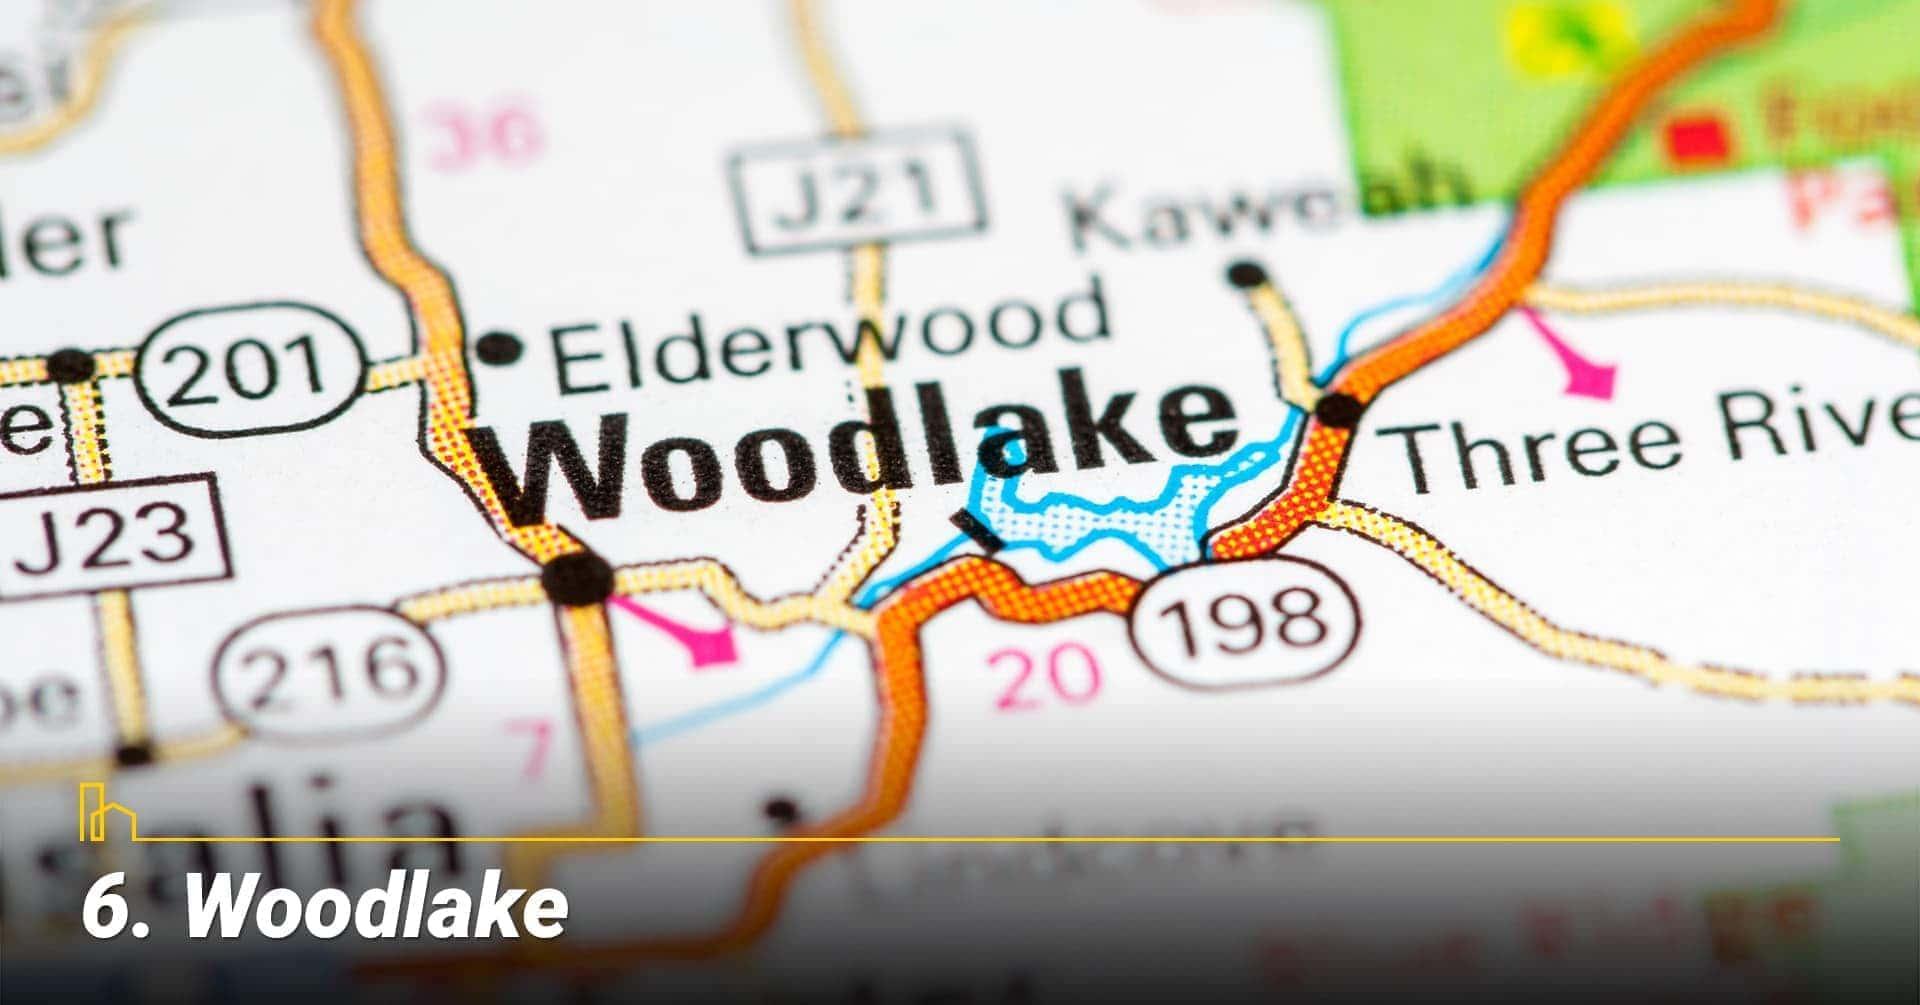 Woodlake, California